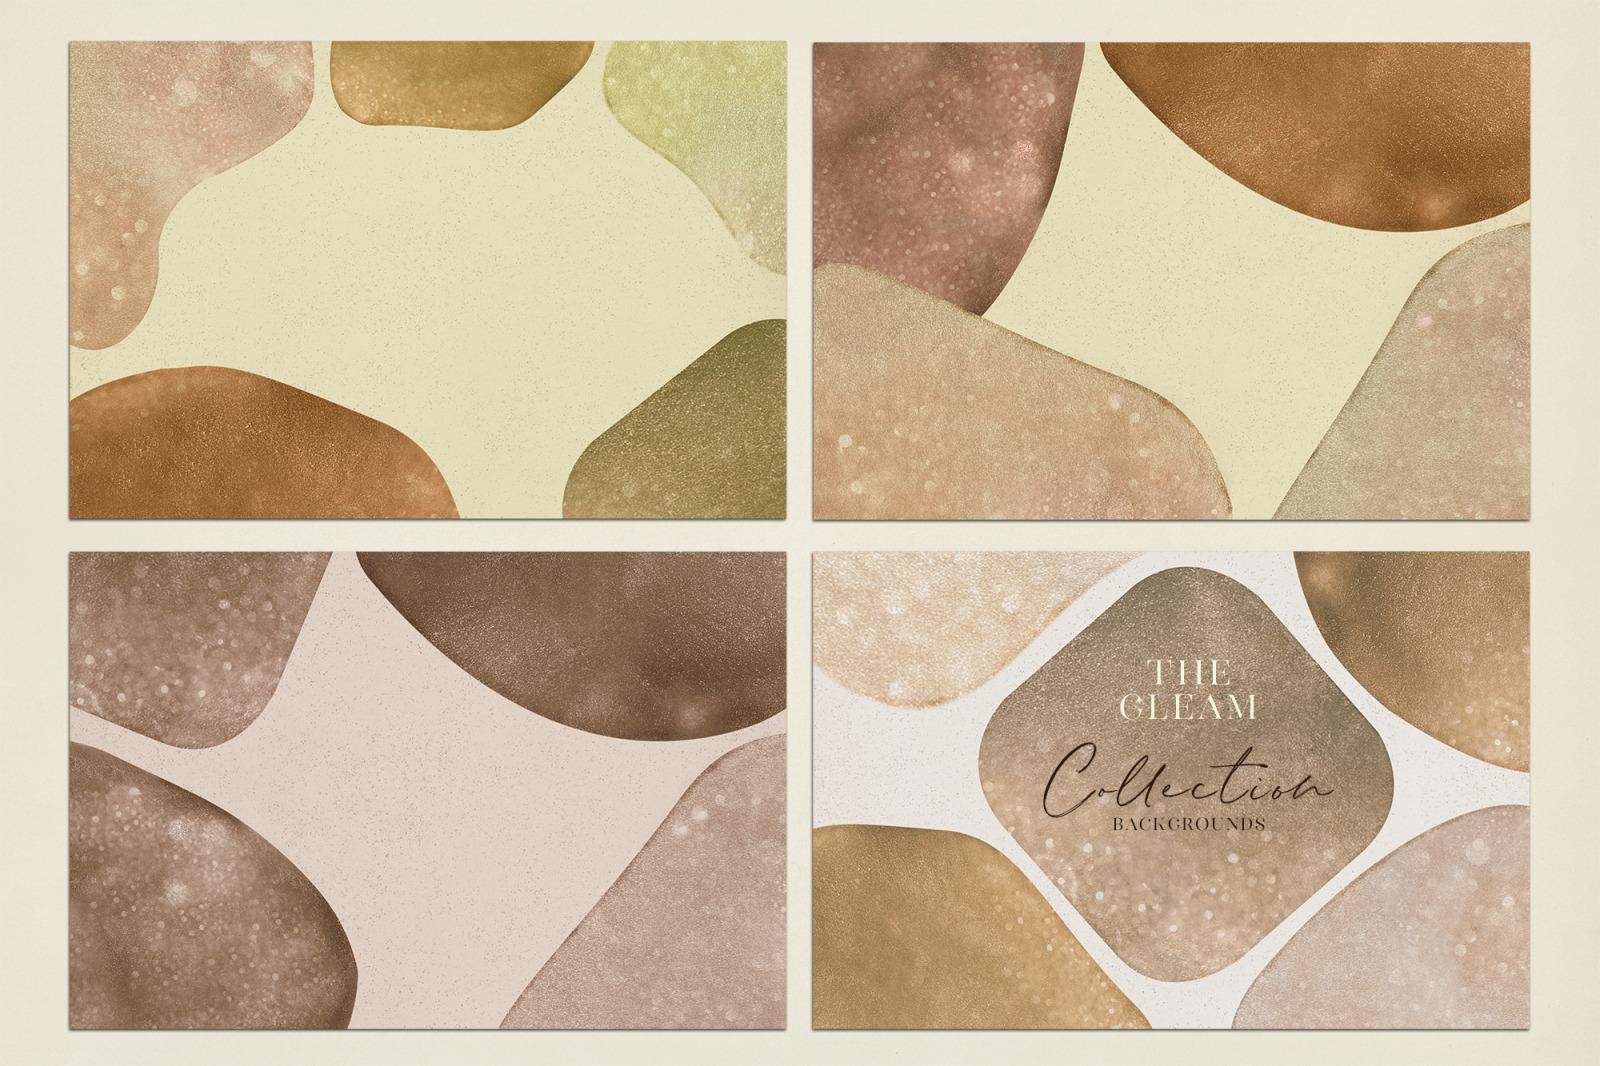 抽象闪闪发光水彩背景图片设计素材 The Gleam Watercolor Shapes插图8